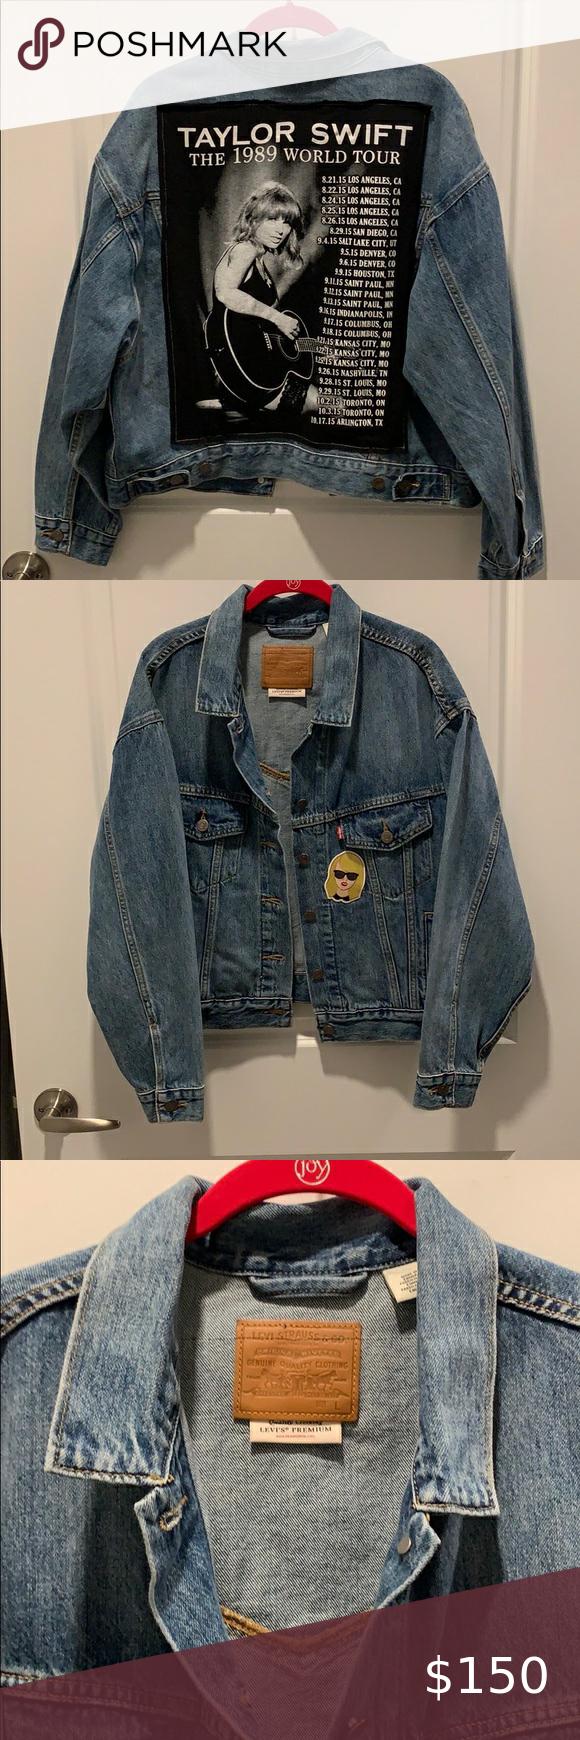 Levi S Taylor Swift Custom Denim Jacket Denim Jacket Custom Denim Jacket Jackets [ 1740 x 580 Pixel ]